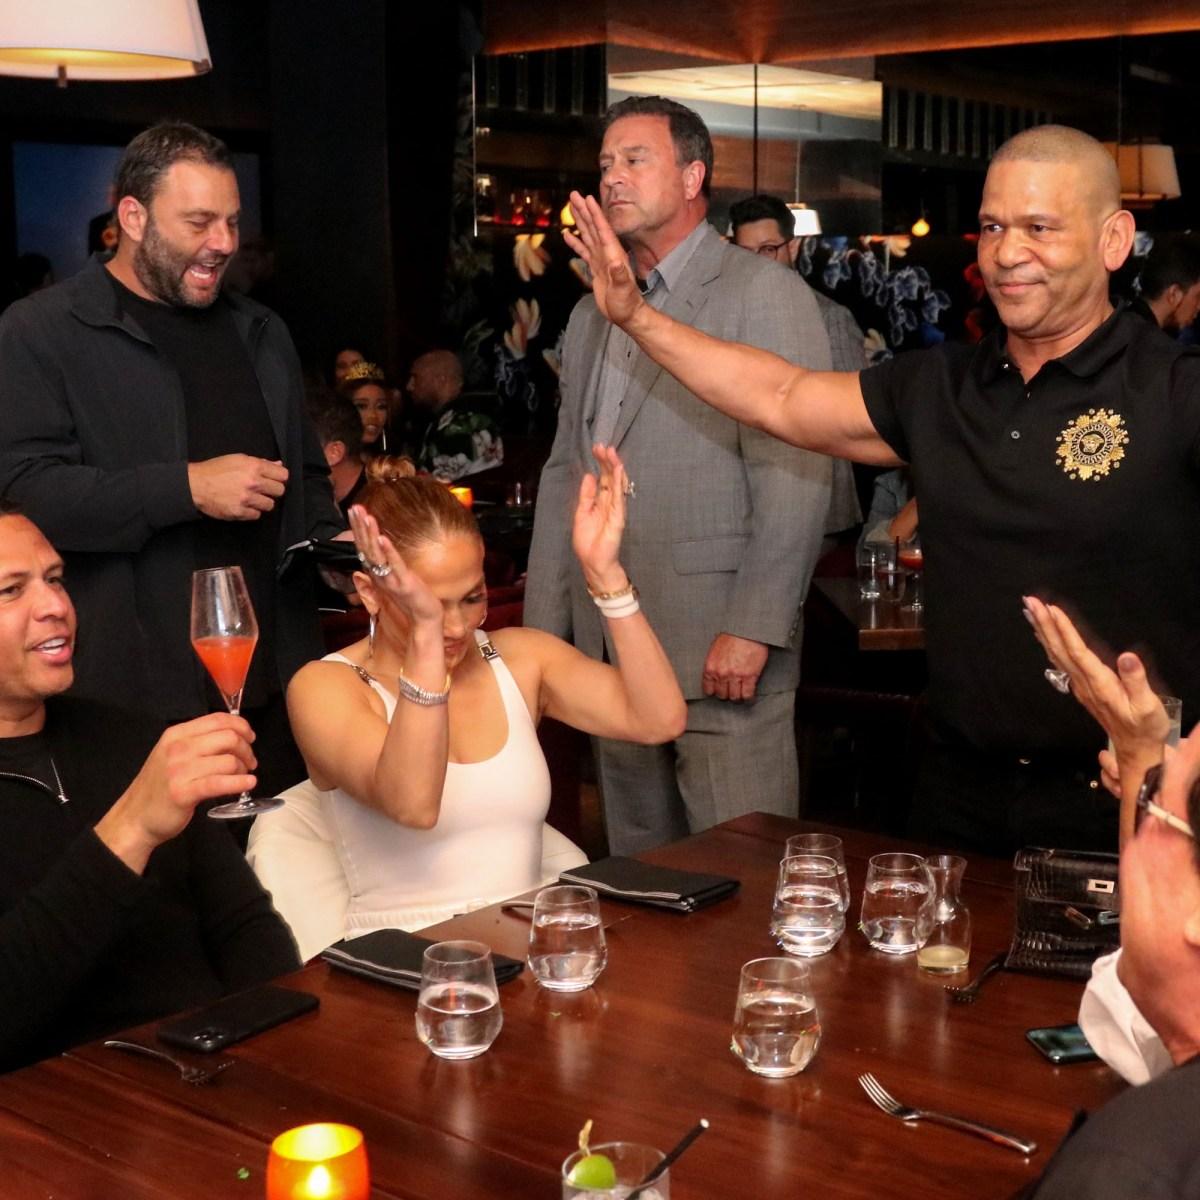 Jennifer Lopez and Fiance Alex Rodriguez Spotted Getting Cozy Celebrating Friend's Birthday in Miami